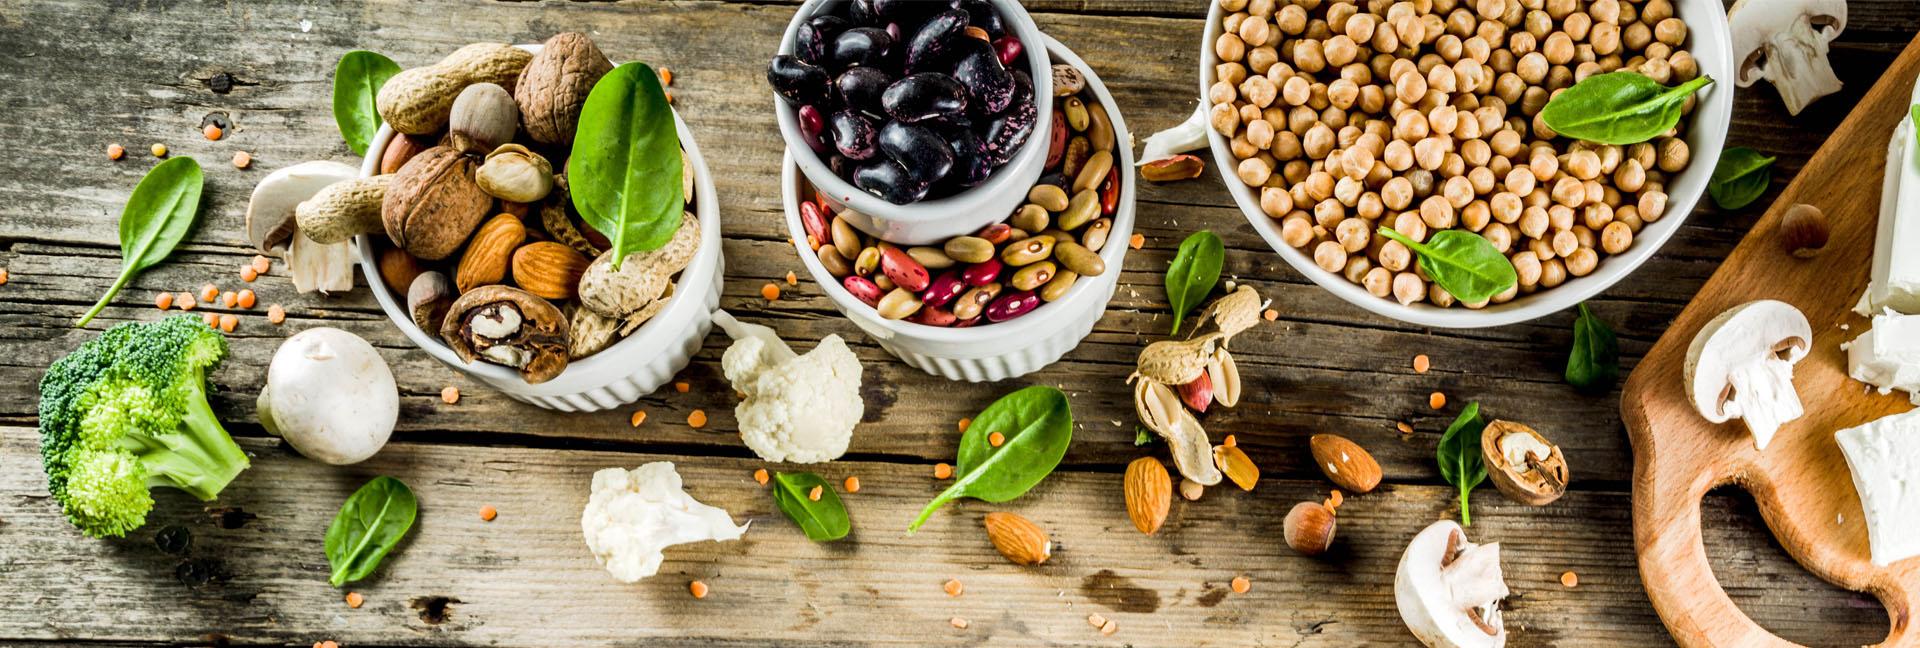 Vegetarische Ernährung, Pilze, Bohnen, Nüsse, Tofu, Gemüse, Kichererbsen